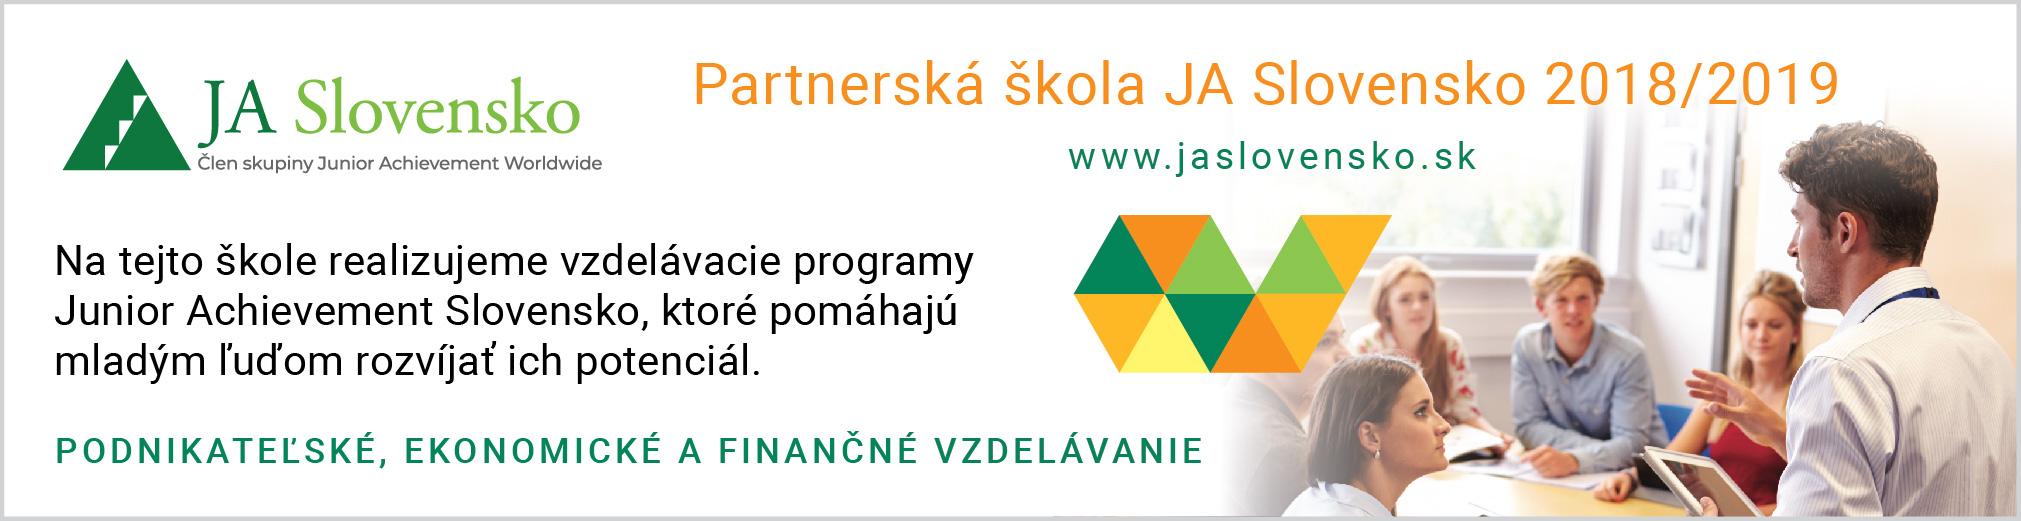 https://www.jaslovensko.sk/images/o-jasr/media/o_jaslovensko-banner-970x250.jpg